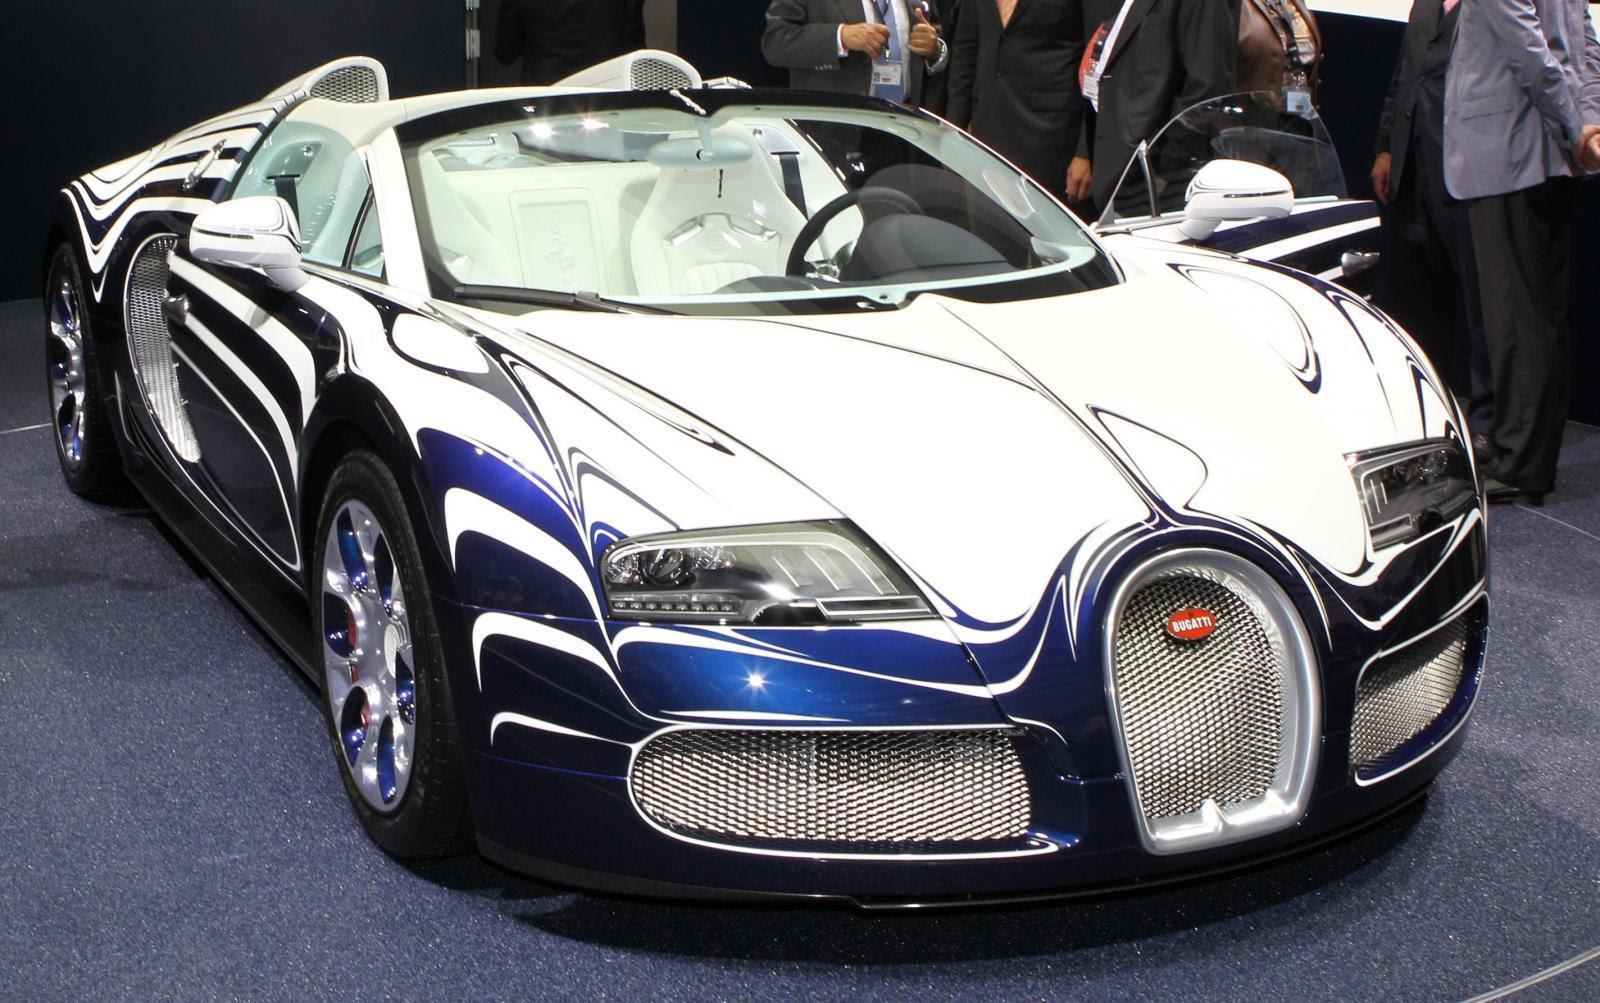 2011 Bugatti Veyron L'Or Blanc 37 - Car-Revs-Daily.com